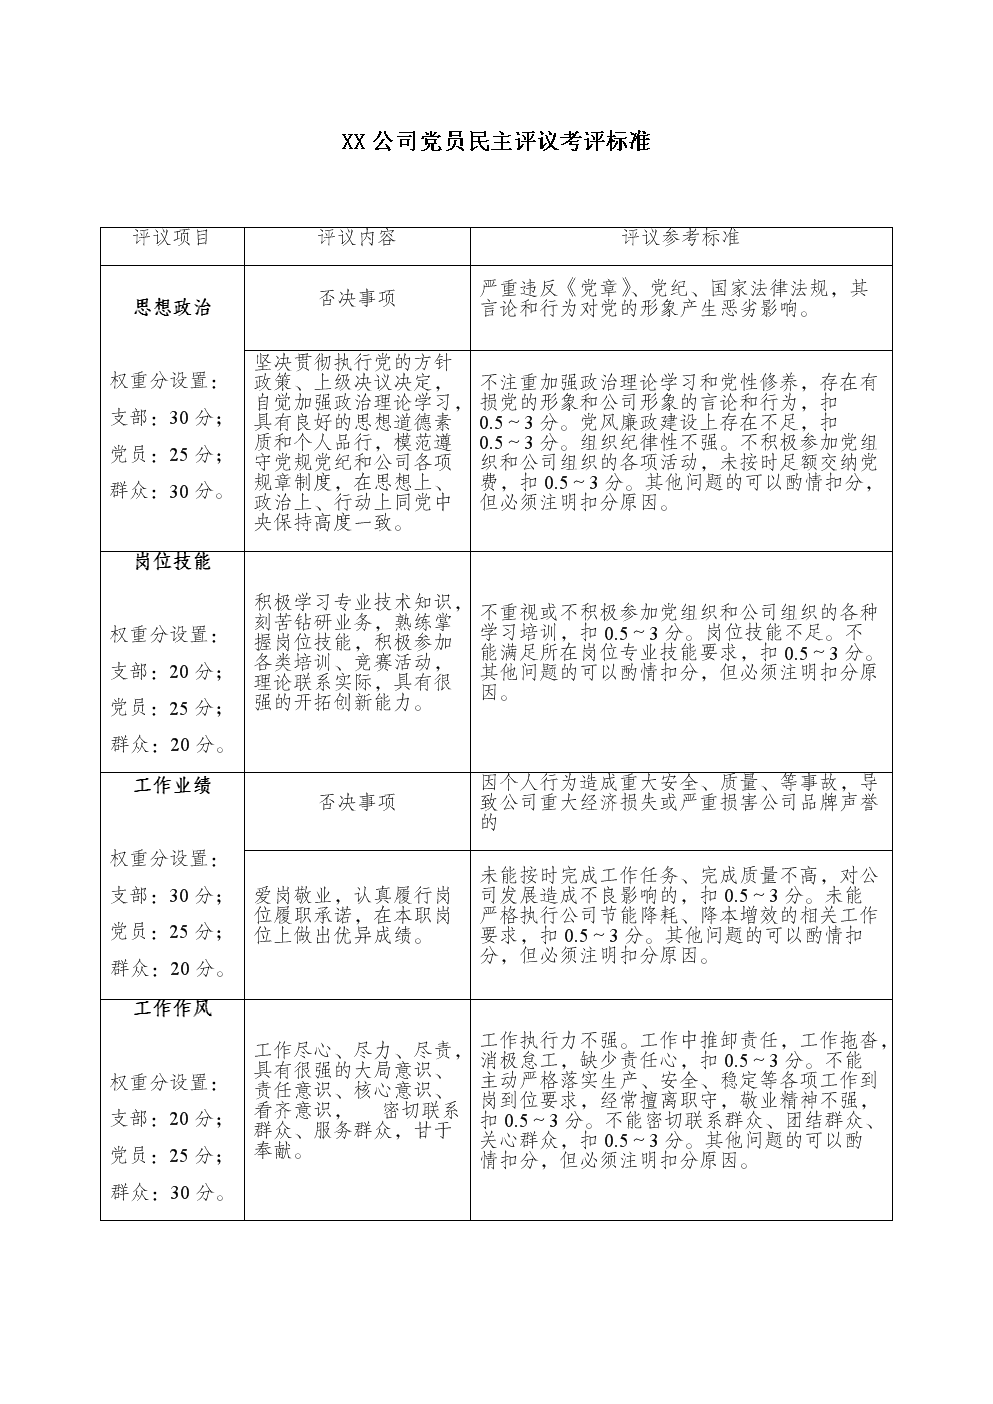 XX公司黨員民主評議考評標準.docx